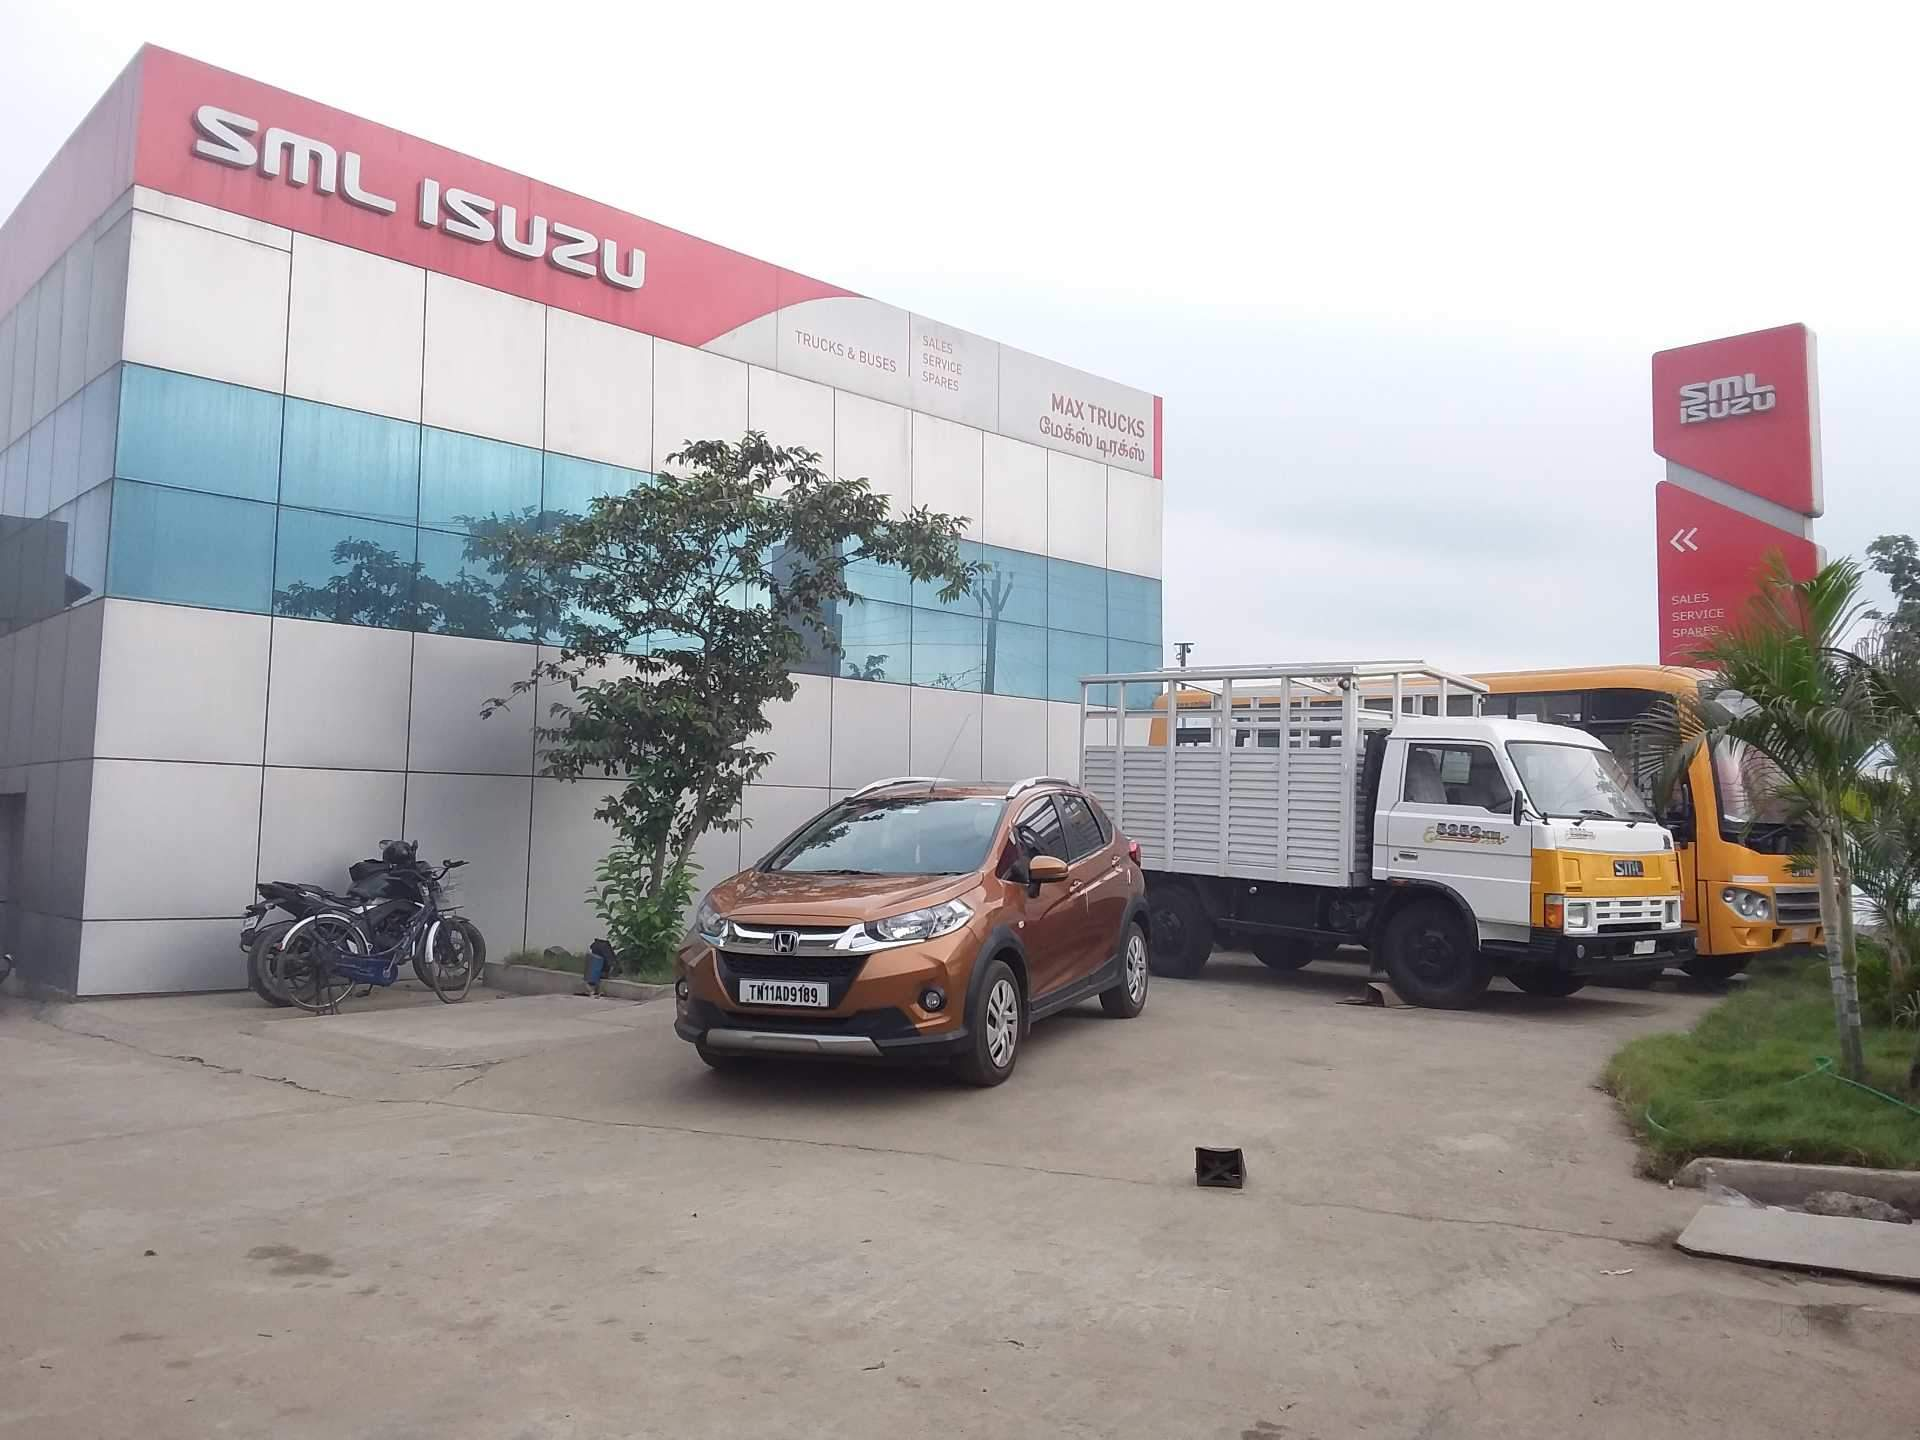 Max Trucks Vandalur   Truck Dealers in Chennai Chennai   Justdial 1920x1440